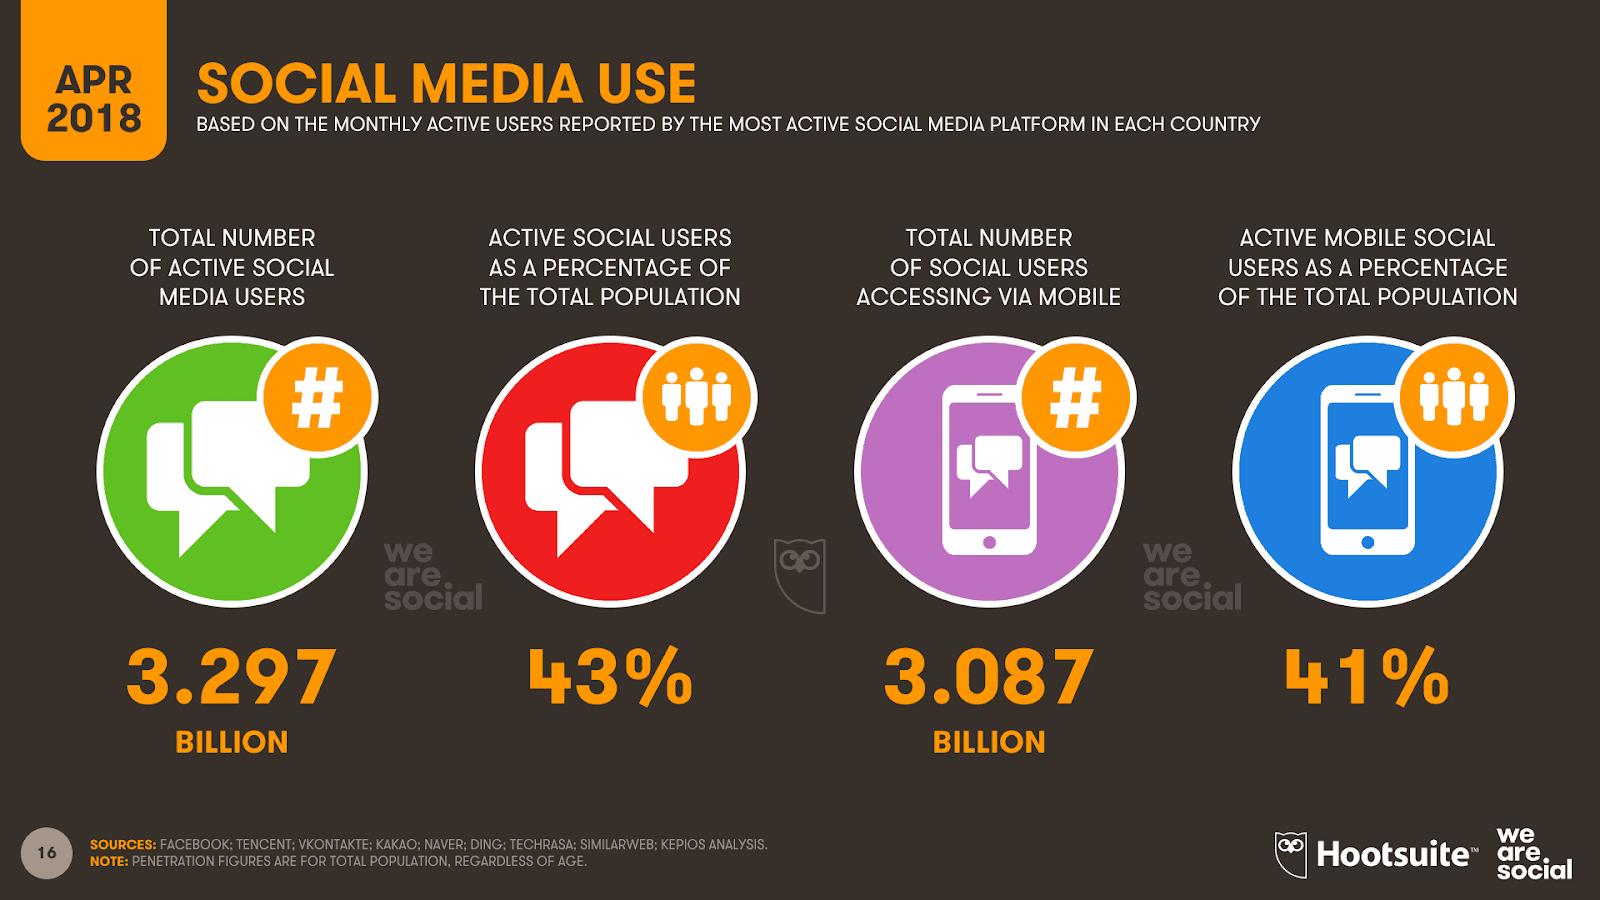 No sign of anti-social behavior - infographic